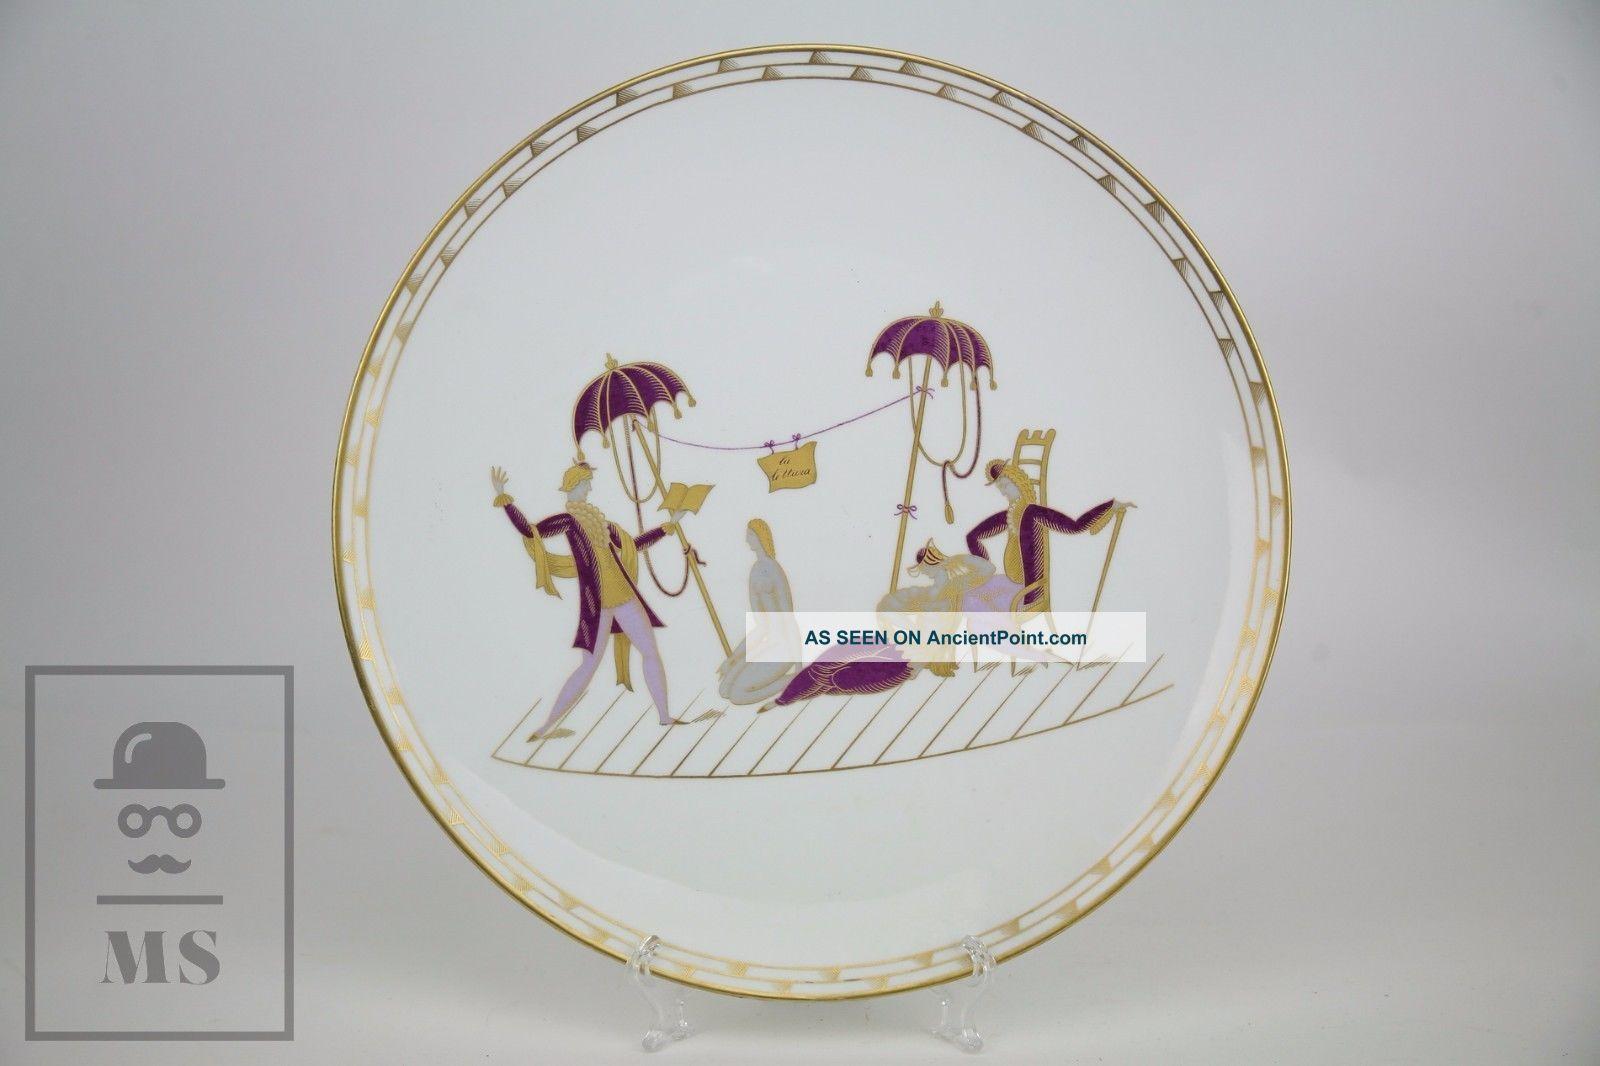 Italian Large Gio Ponti For Richard Ginori Porcelain Plate - La Lettura Plates & Chargers photo